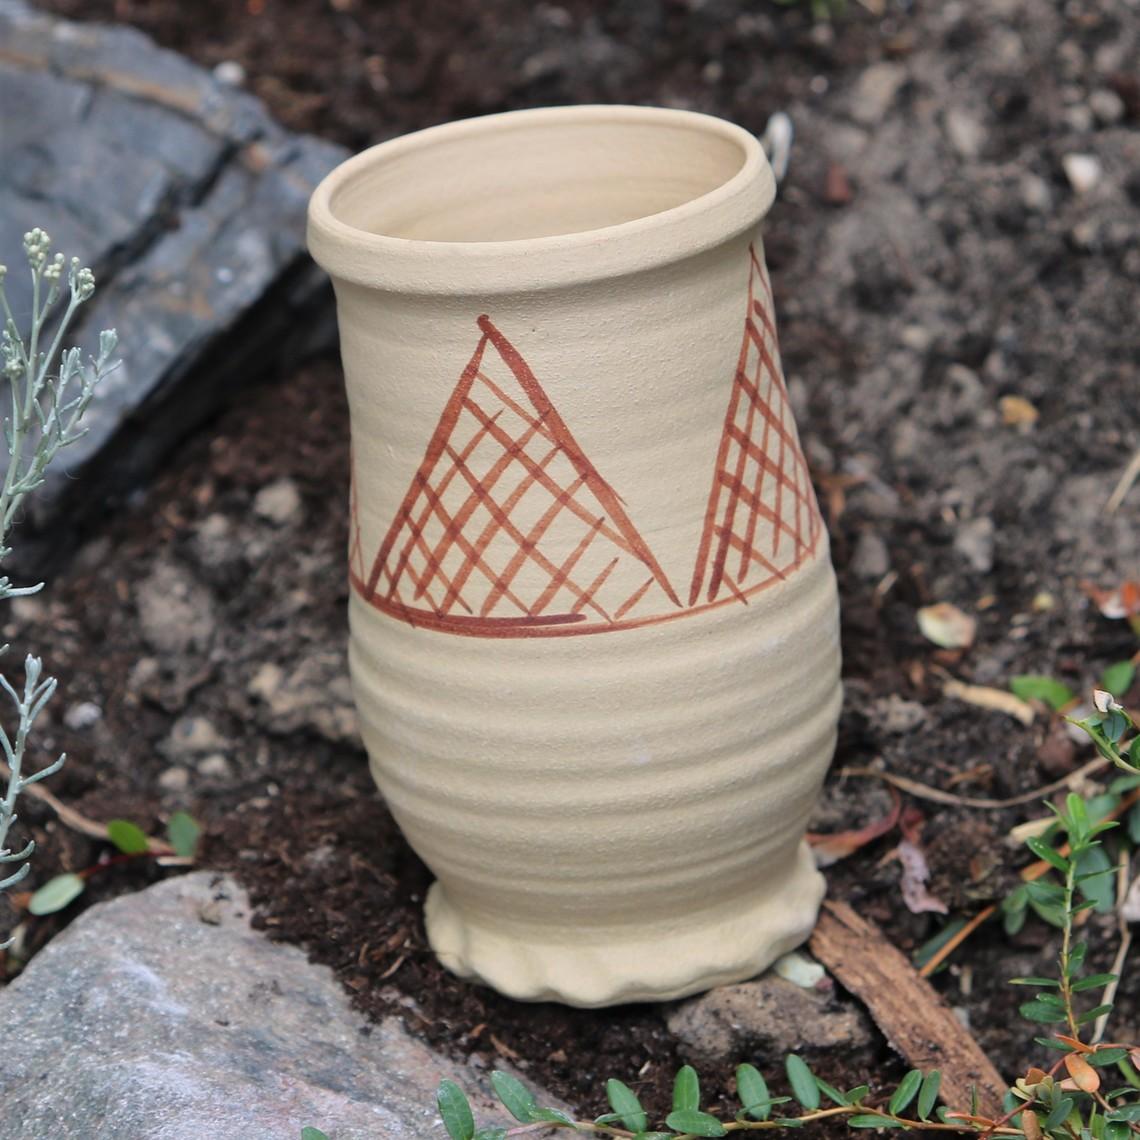 Pingsdorf tazza 10-12th secolo